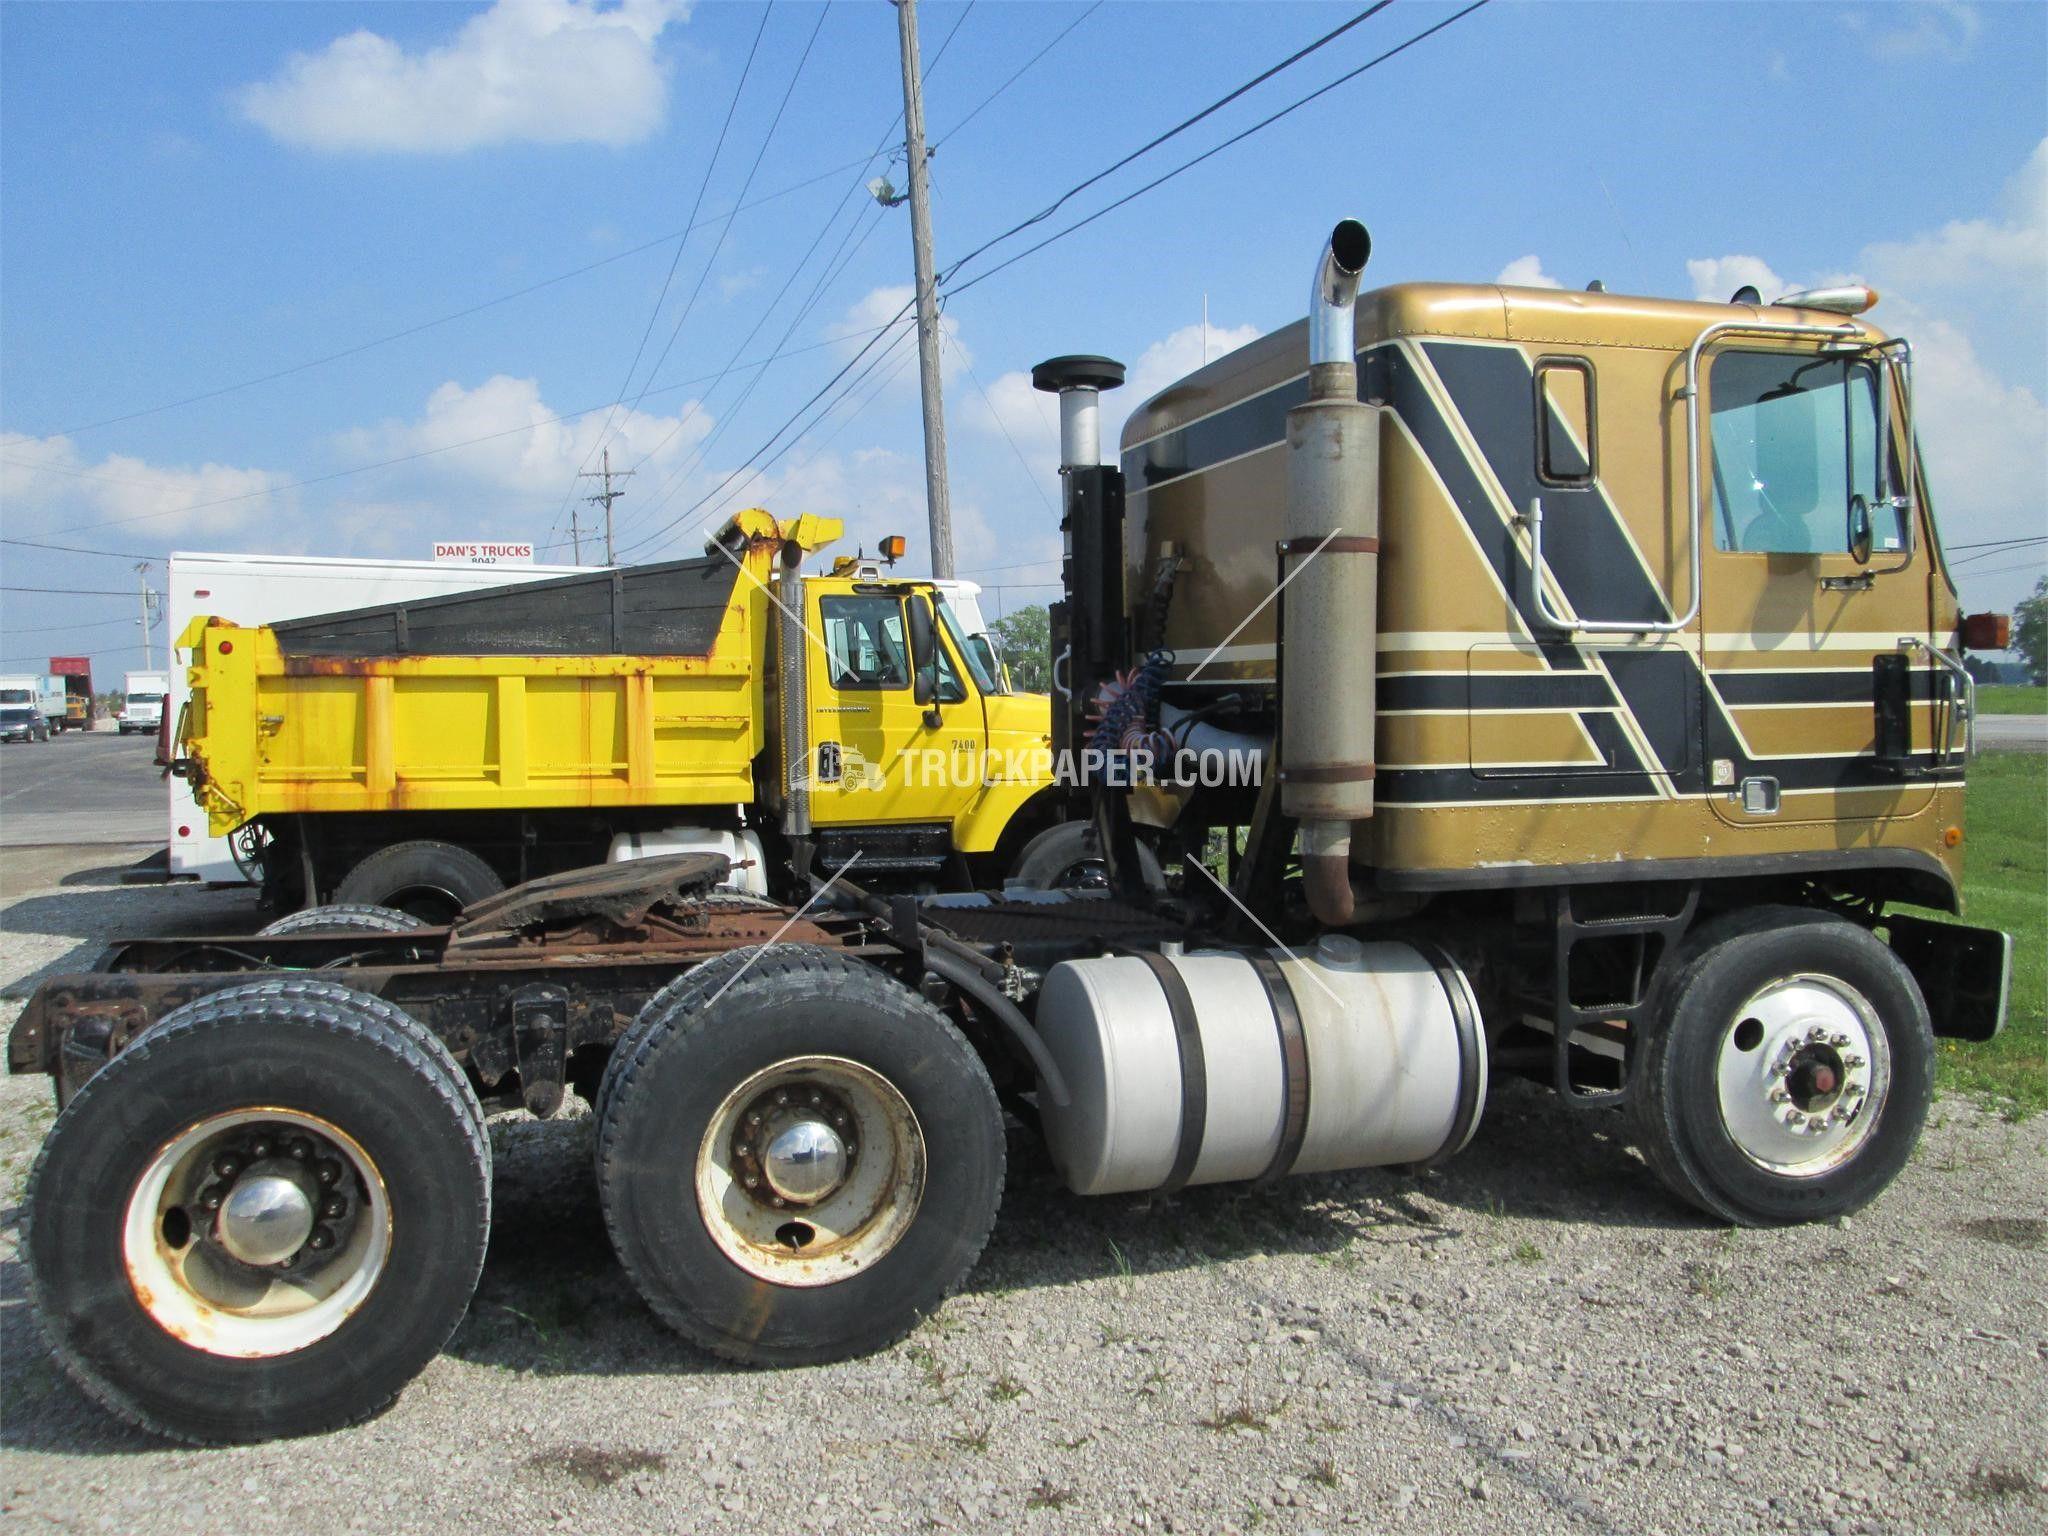 1982 Gmc Astro Heavy Duty Trucks Cabover Trucks W Sleeper For Sale At Truckpaper Com Model Truck Kits Gmc Trucks Heavy Truck